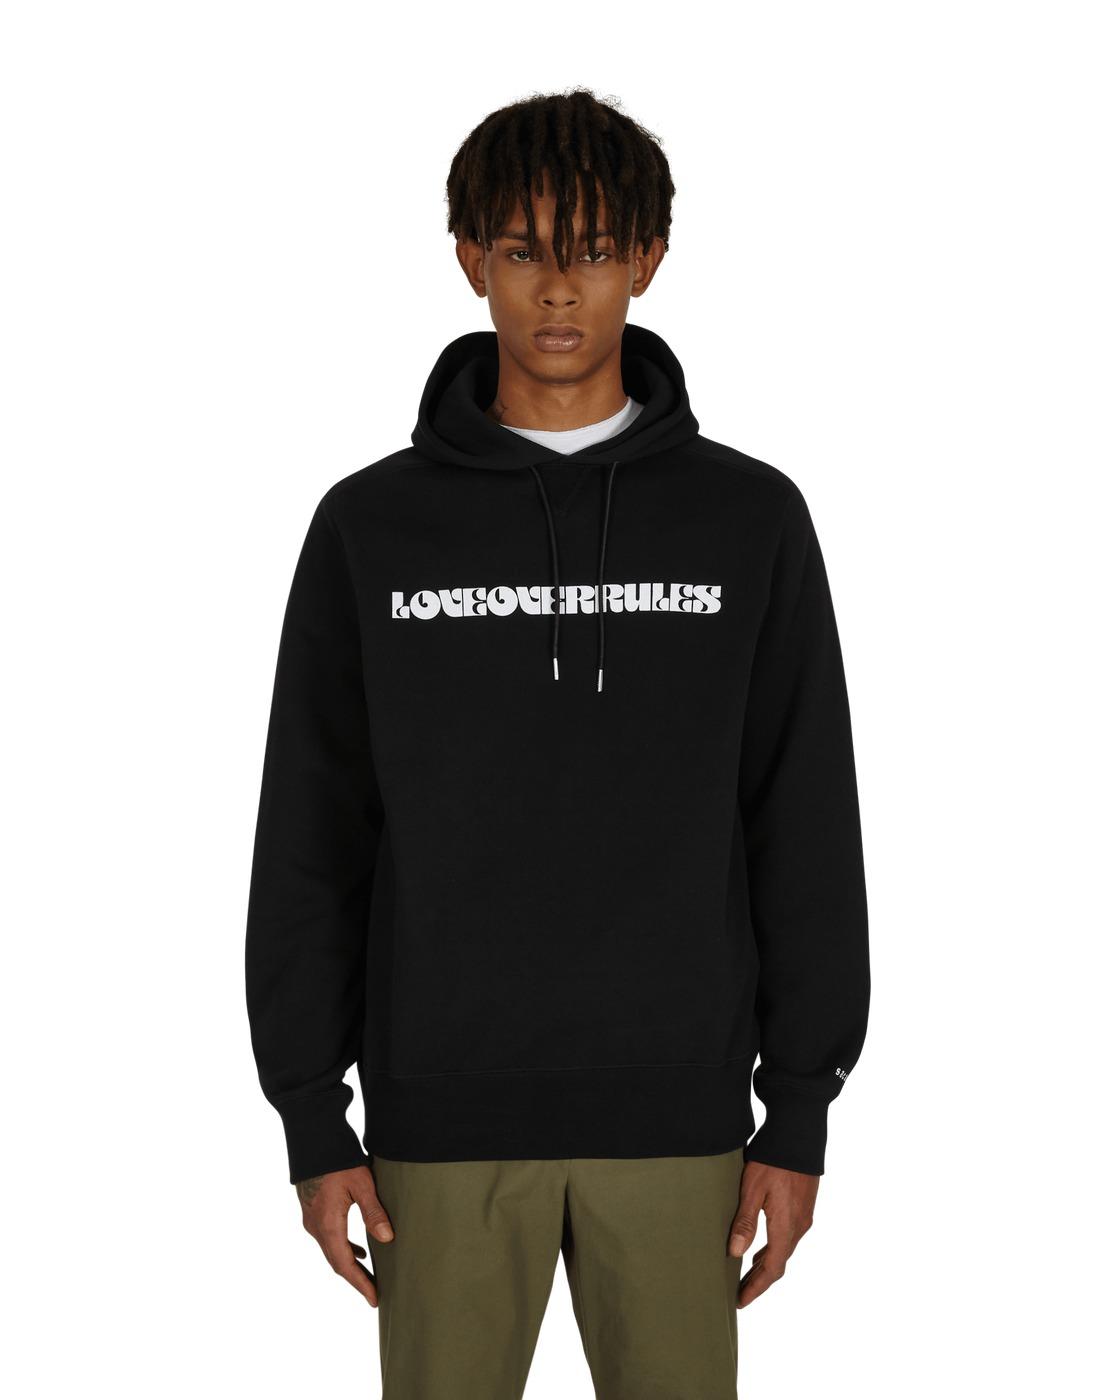 Sacai Hank Willis Thomas Graphic Hooded Sweatshirt Black/White